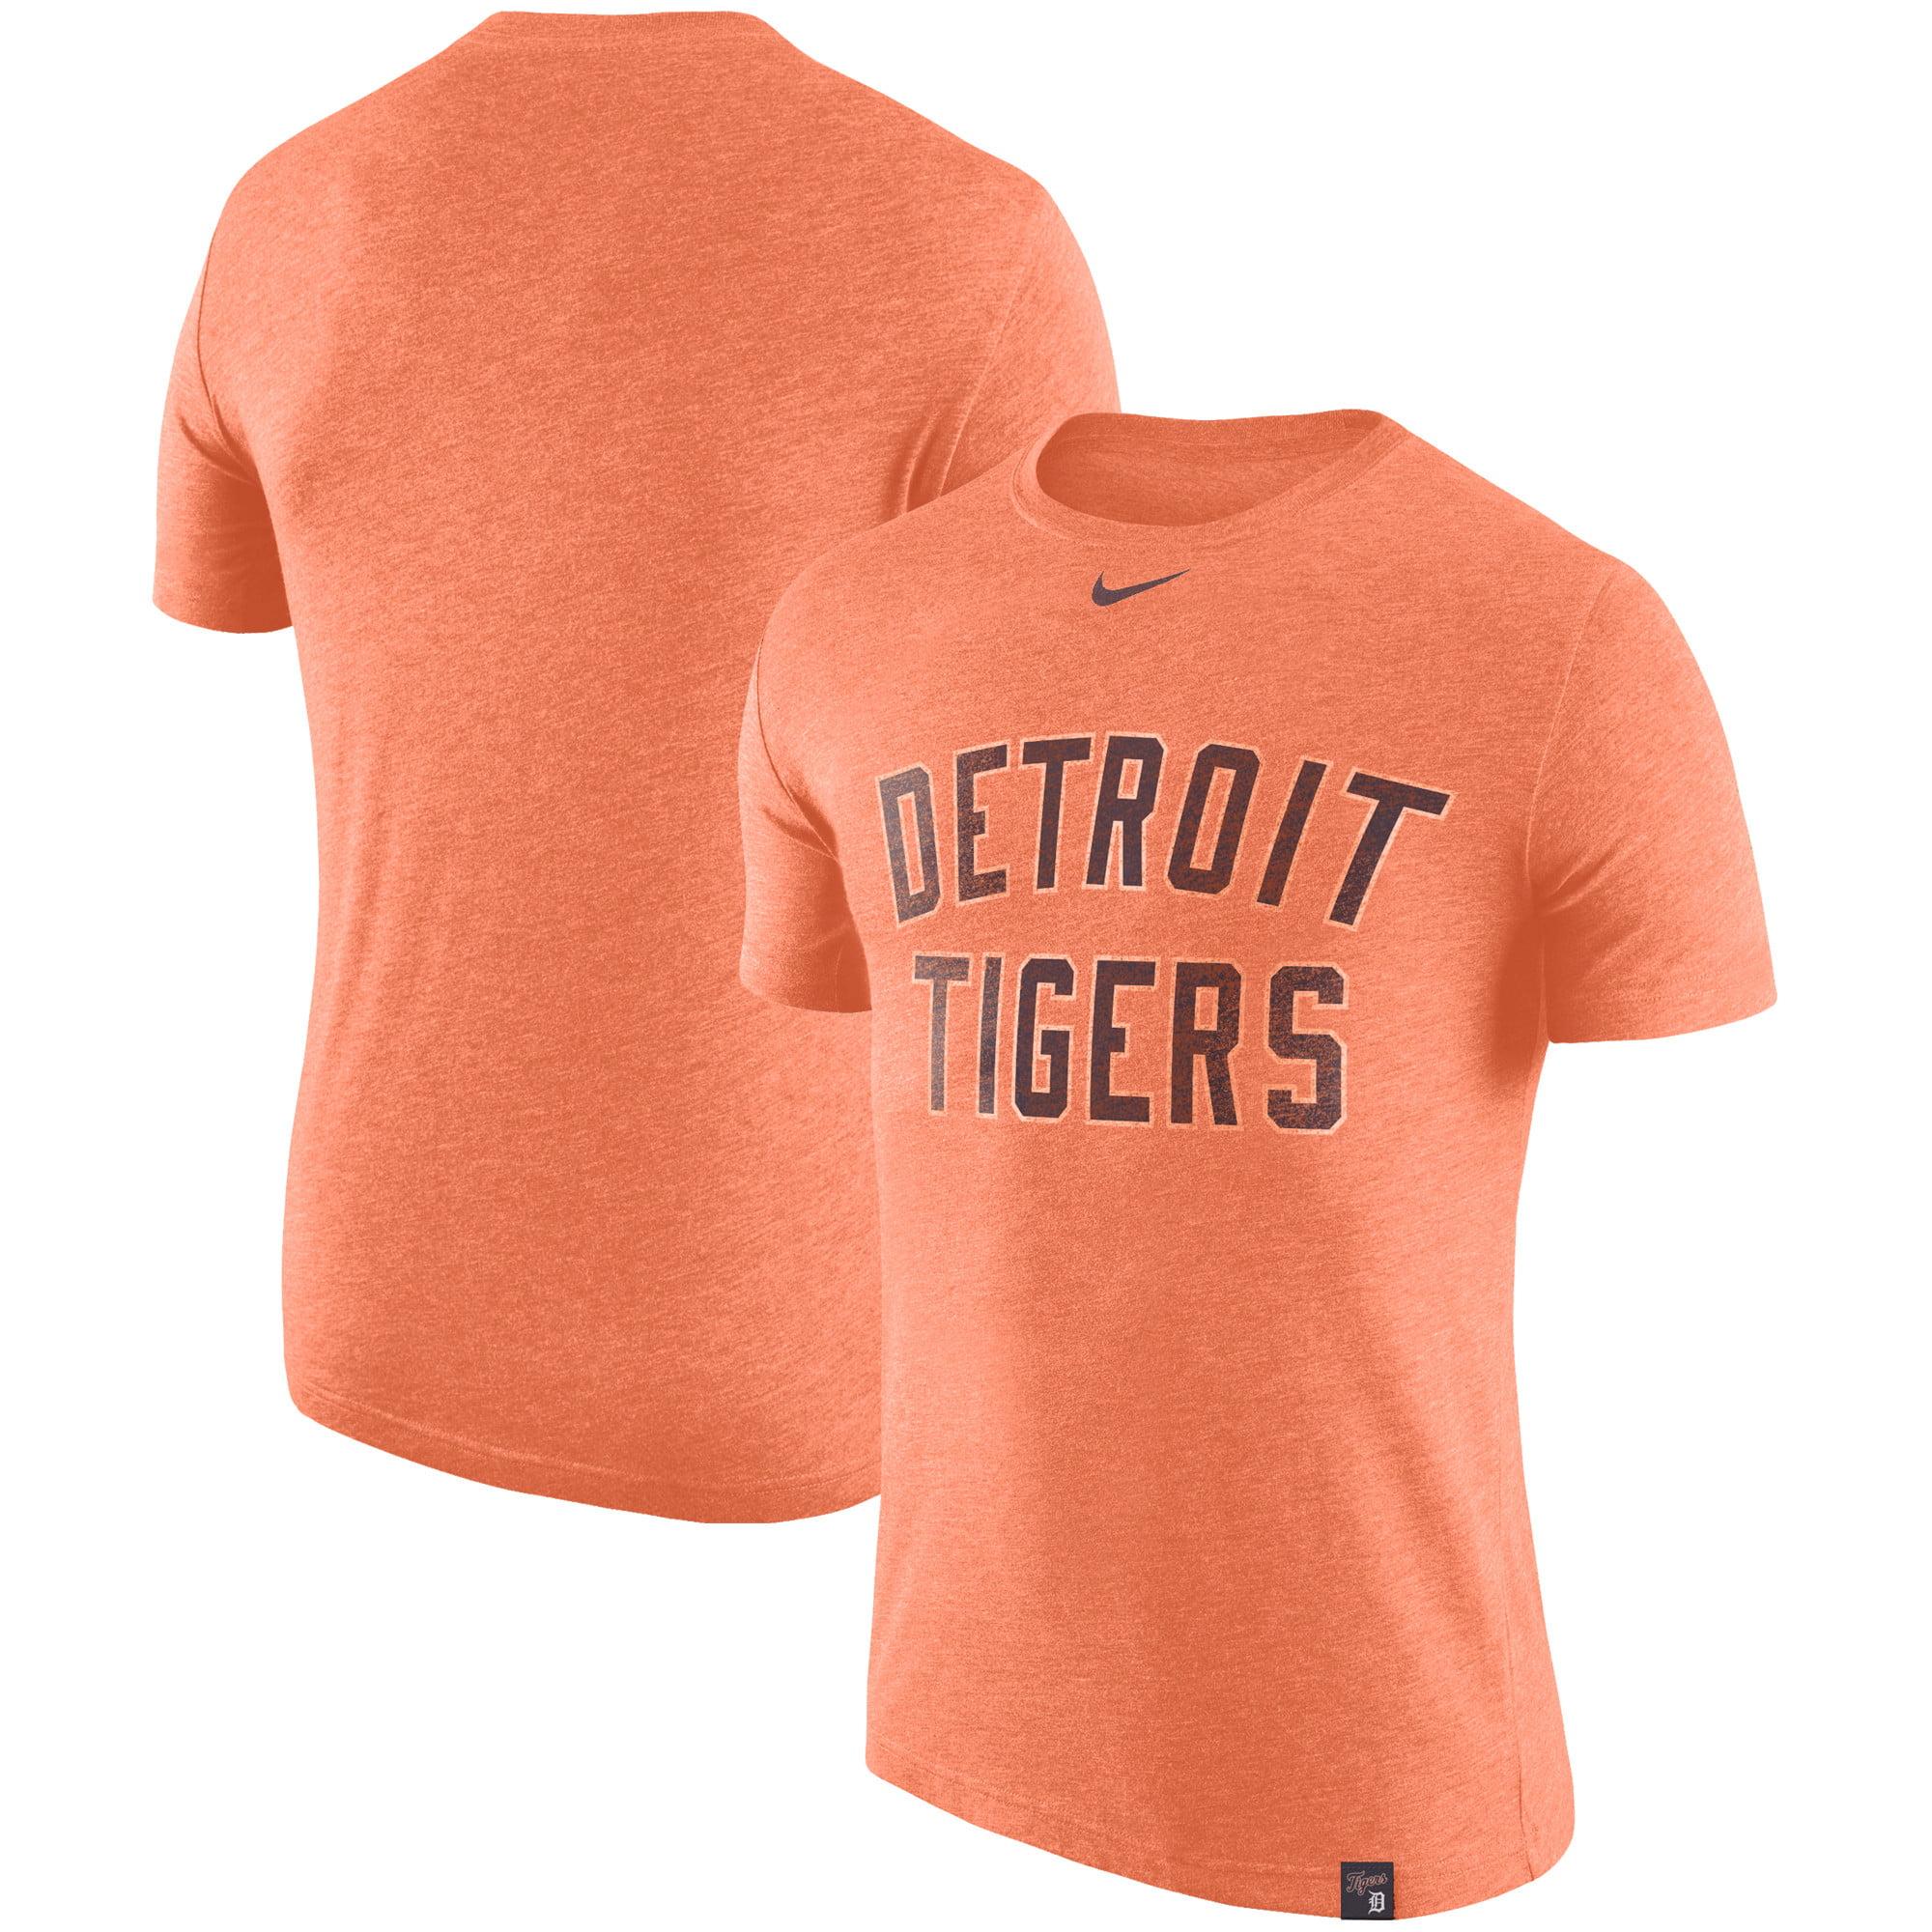 Detroit Tigers Nike Tri-Blend DNA Performance T-Shirt - Heathered Orange